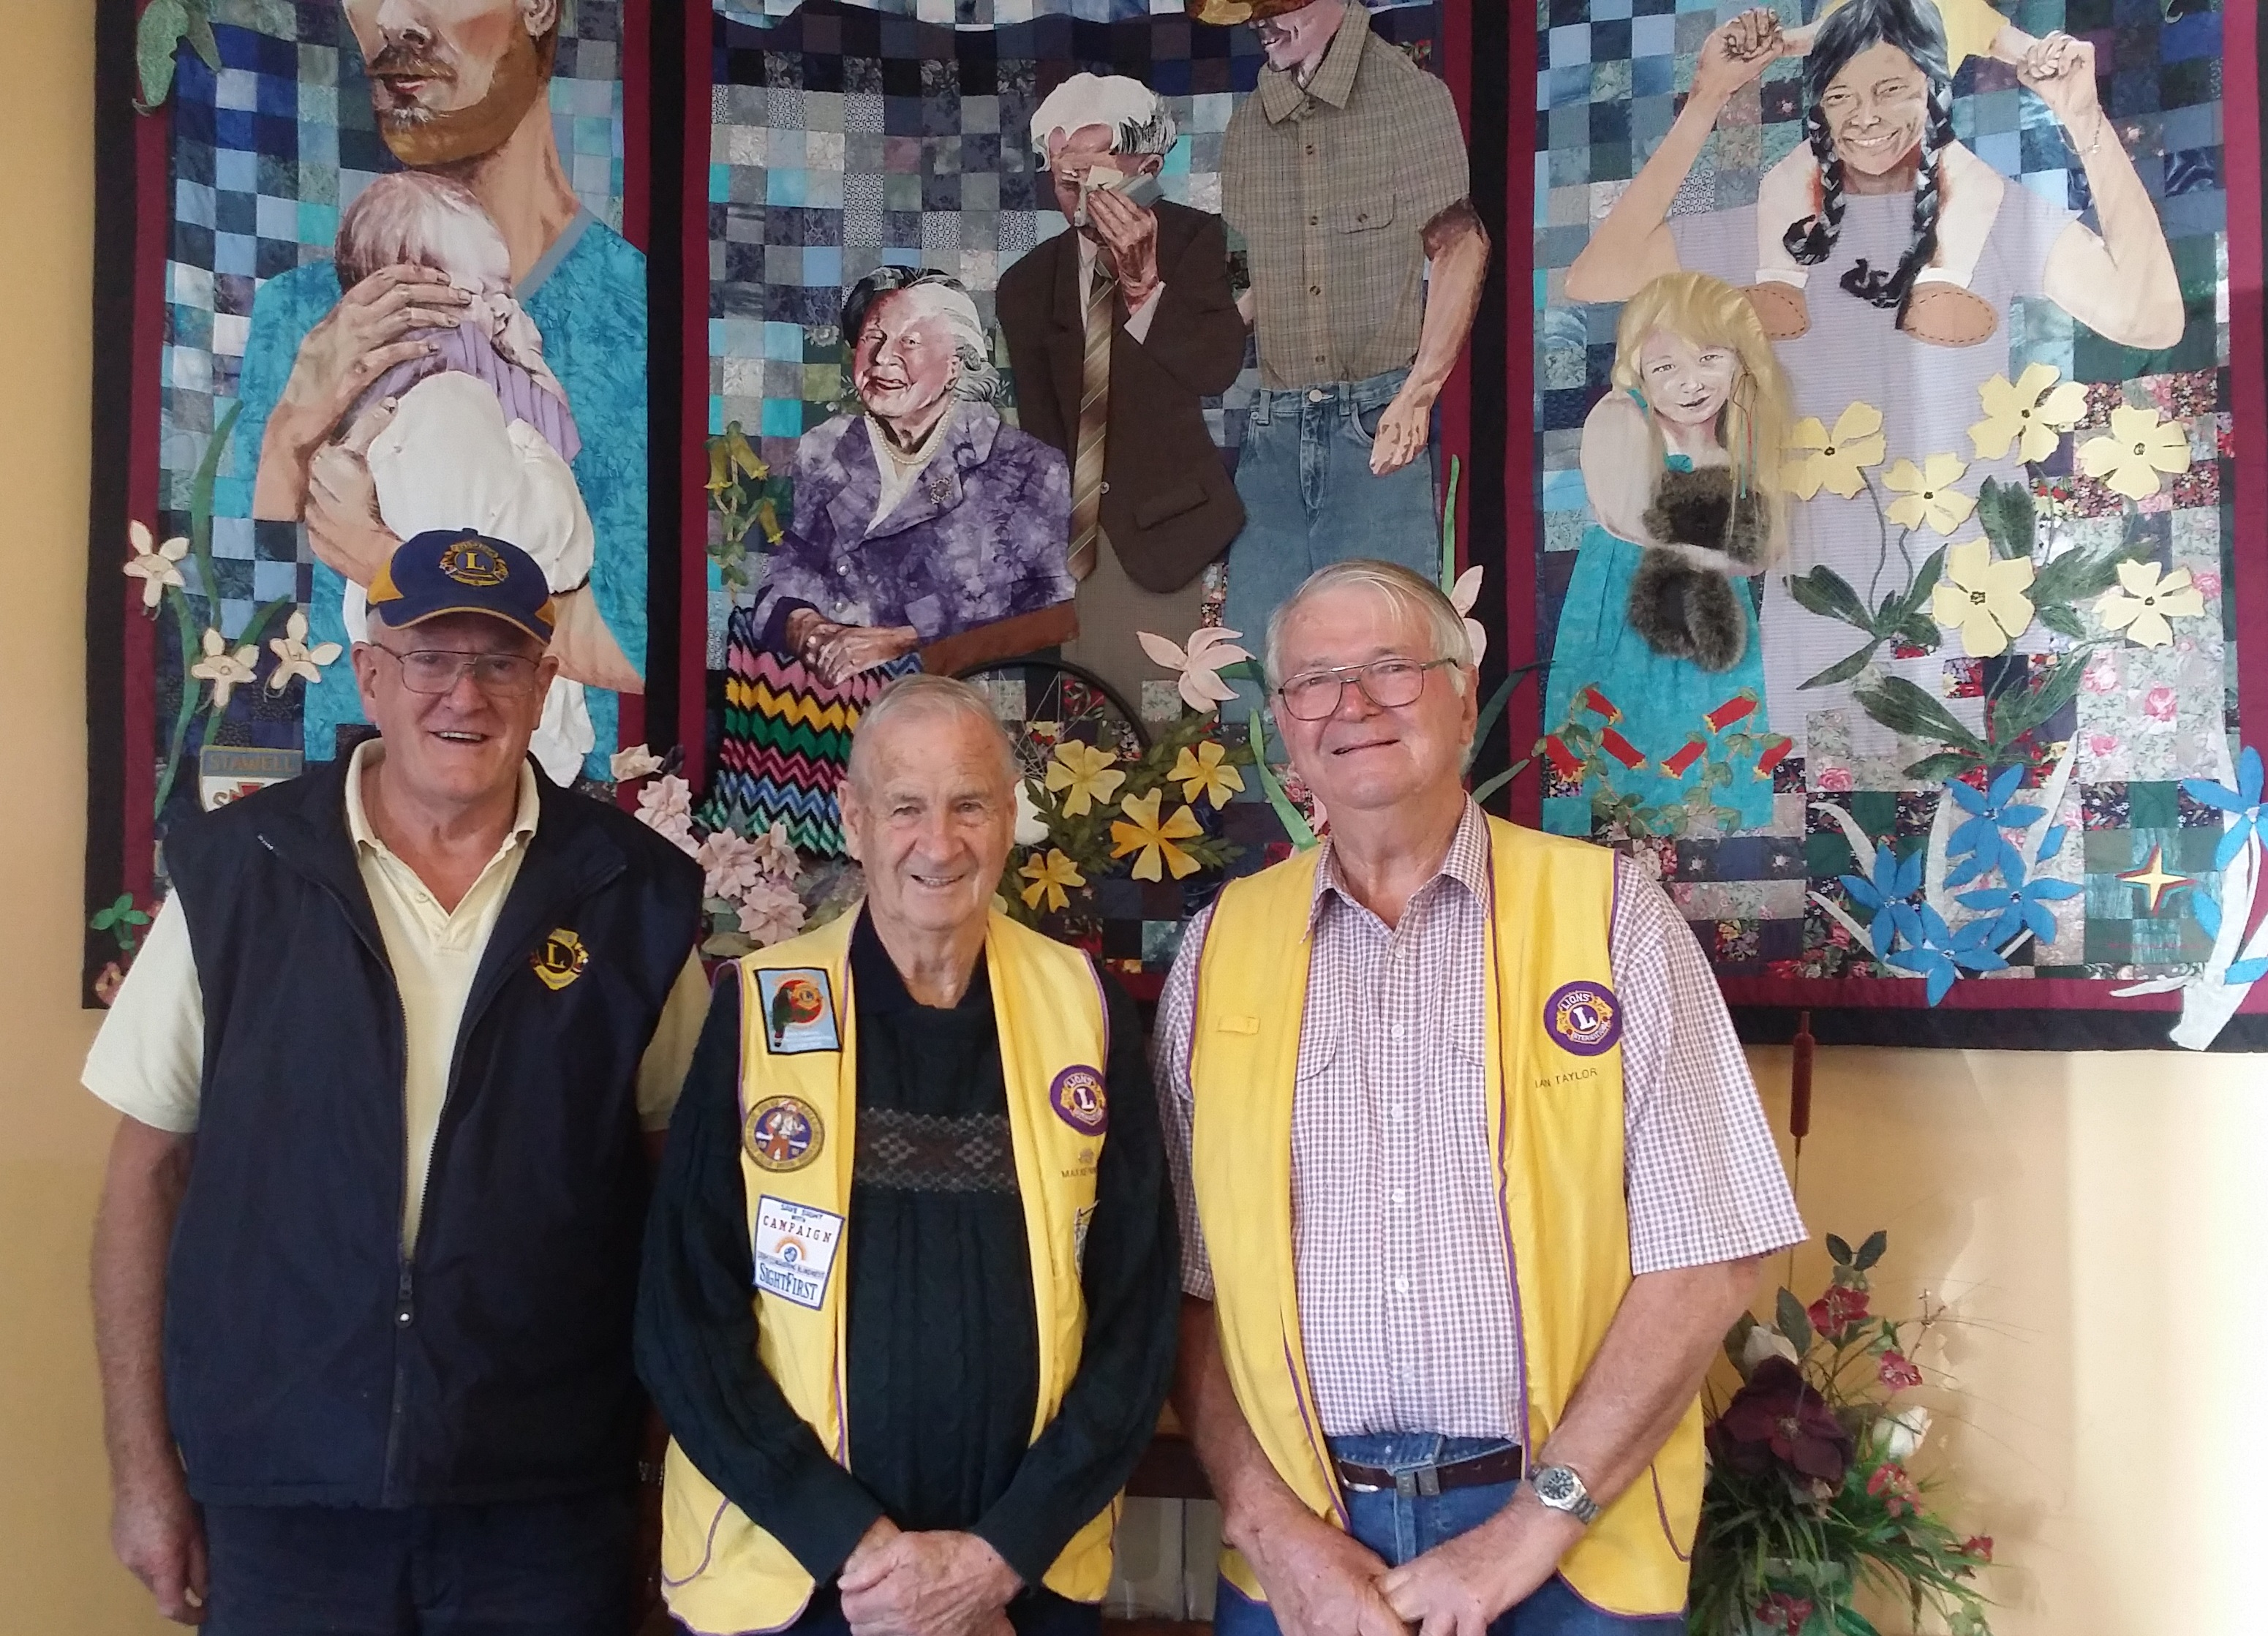 Lions Club members